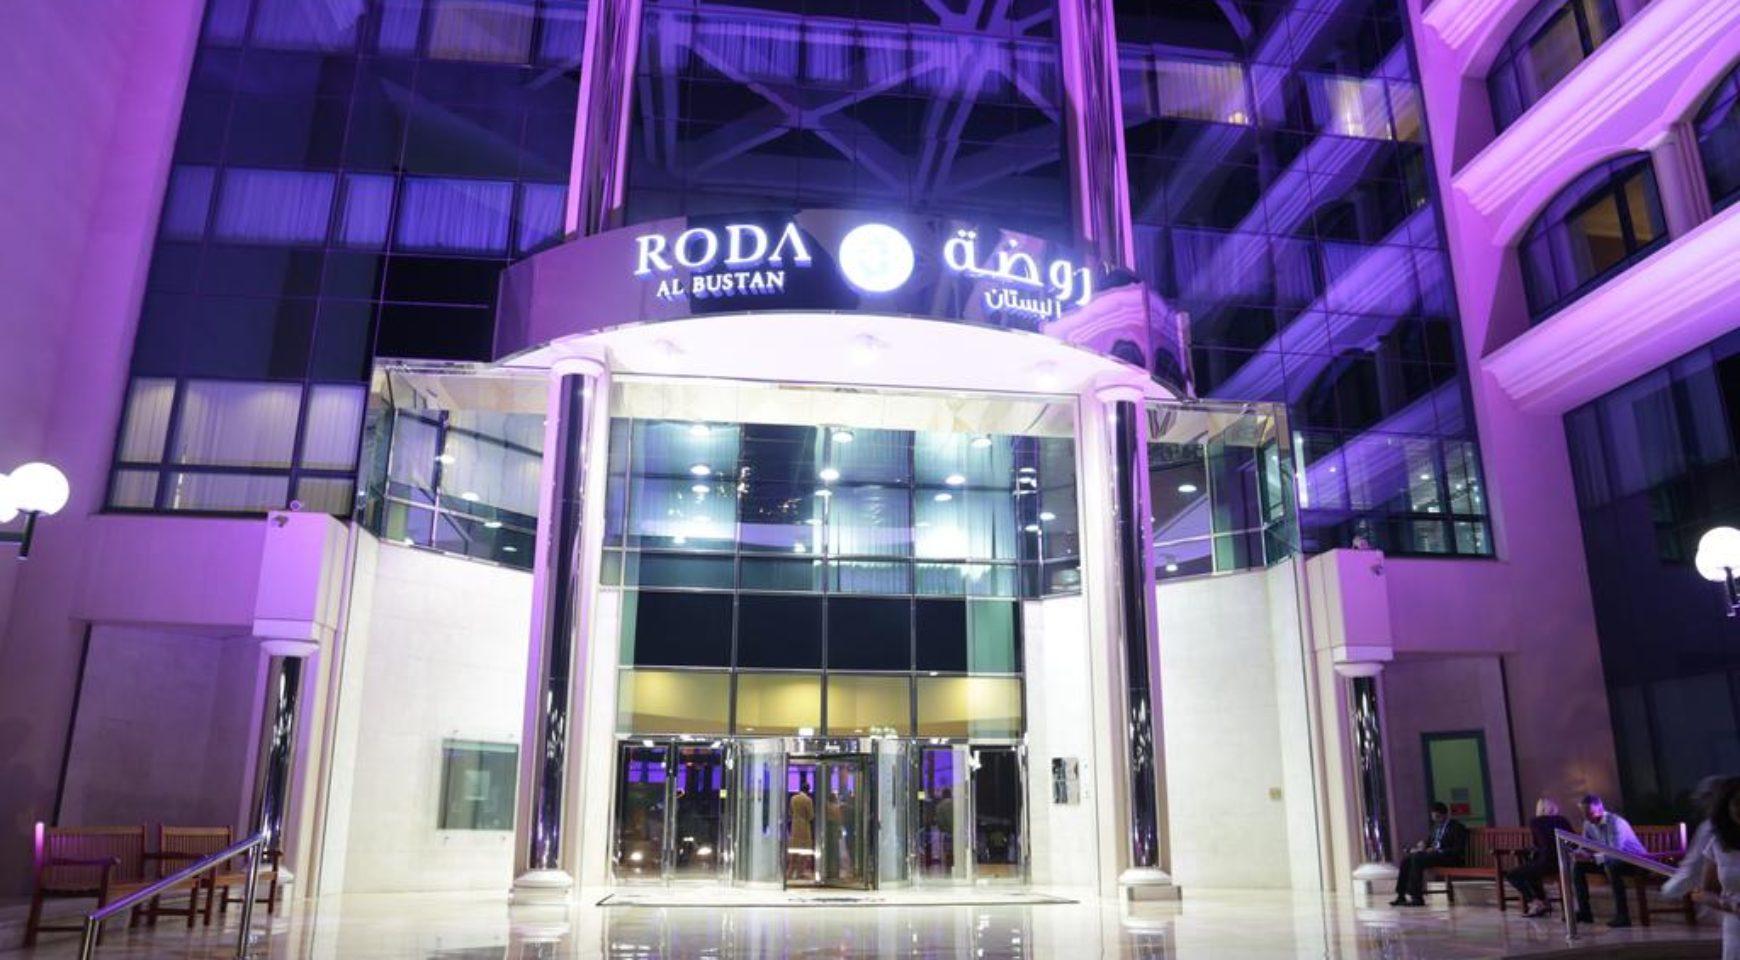 Roda al bustan hotel dubai hotels guide for Dubai 5 star hotel deals